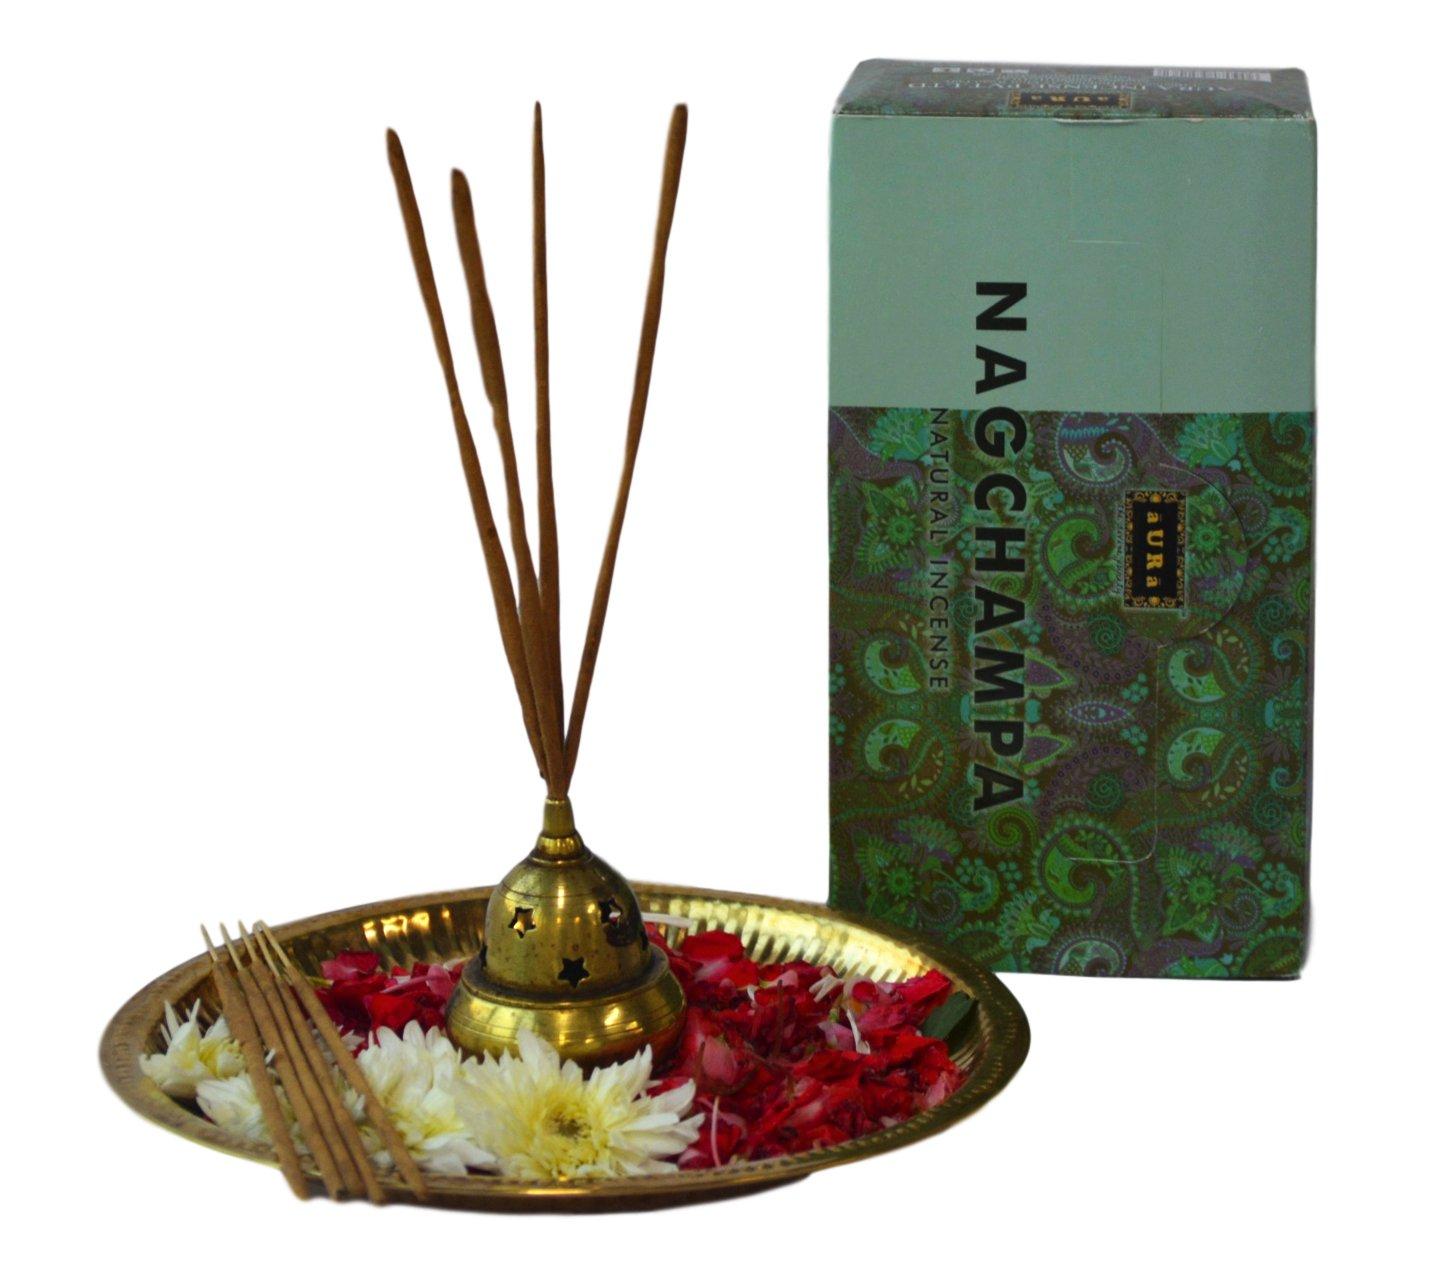 Aura Premium Aromatherapy Natural Incense Sticks, Nag Champa Masala Incense Sticks (12 x 15gms),VALUE PACK-120 sticks B071PD55CF